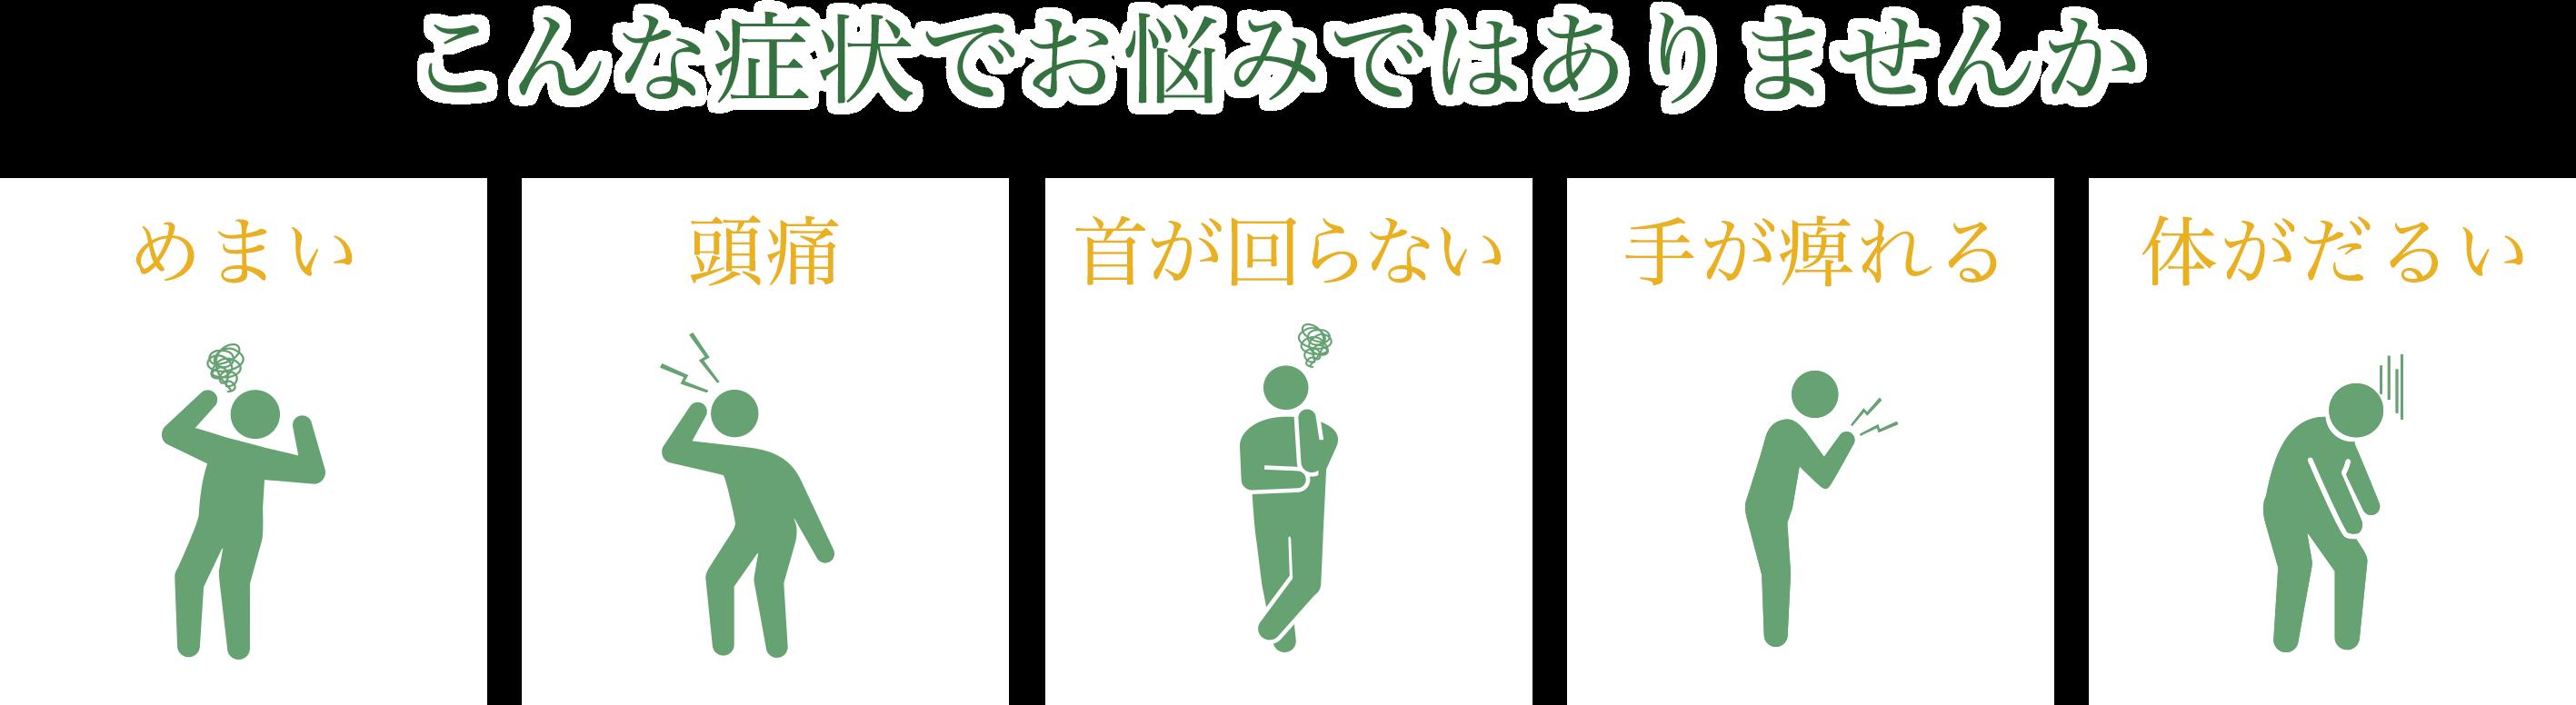 img_accident_symptom